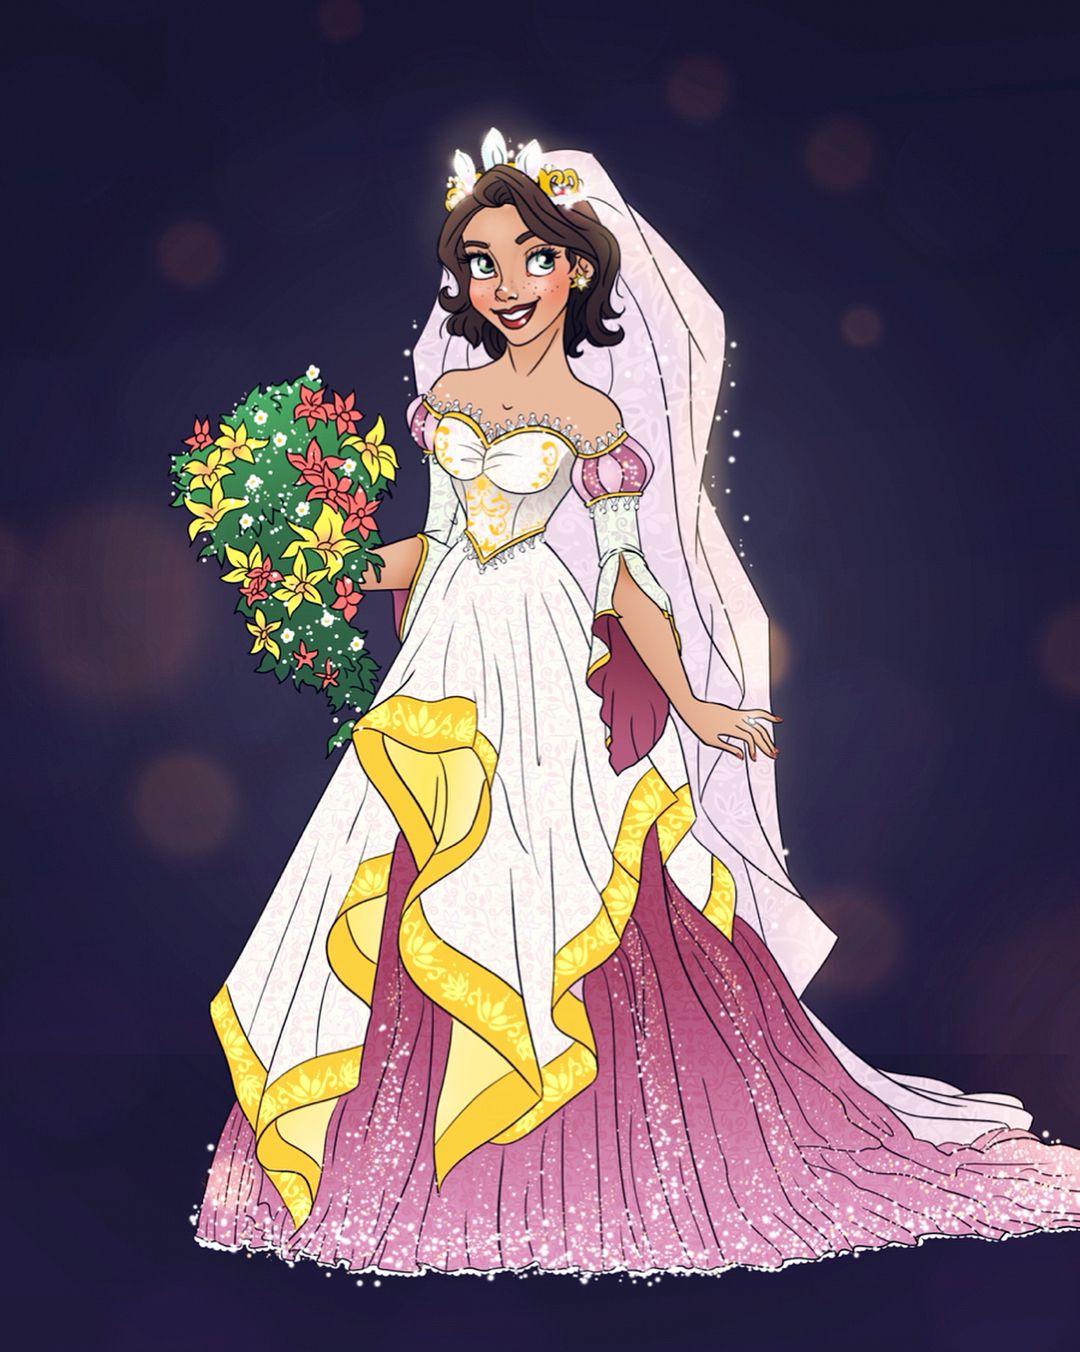 Rapunzel In Her Wedding Dress Guess Who S Next Tangled Rapunzel Disney Weddingdress Disney Disney Bride Disney Rapunzel Disney Princess Wedding [ 1352 x 1080 Pixel ]